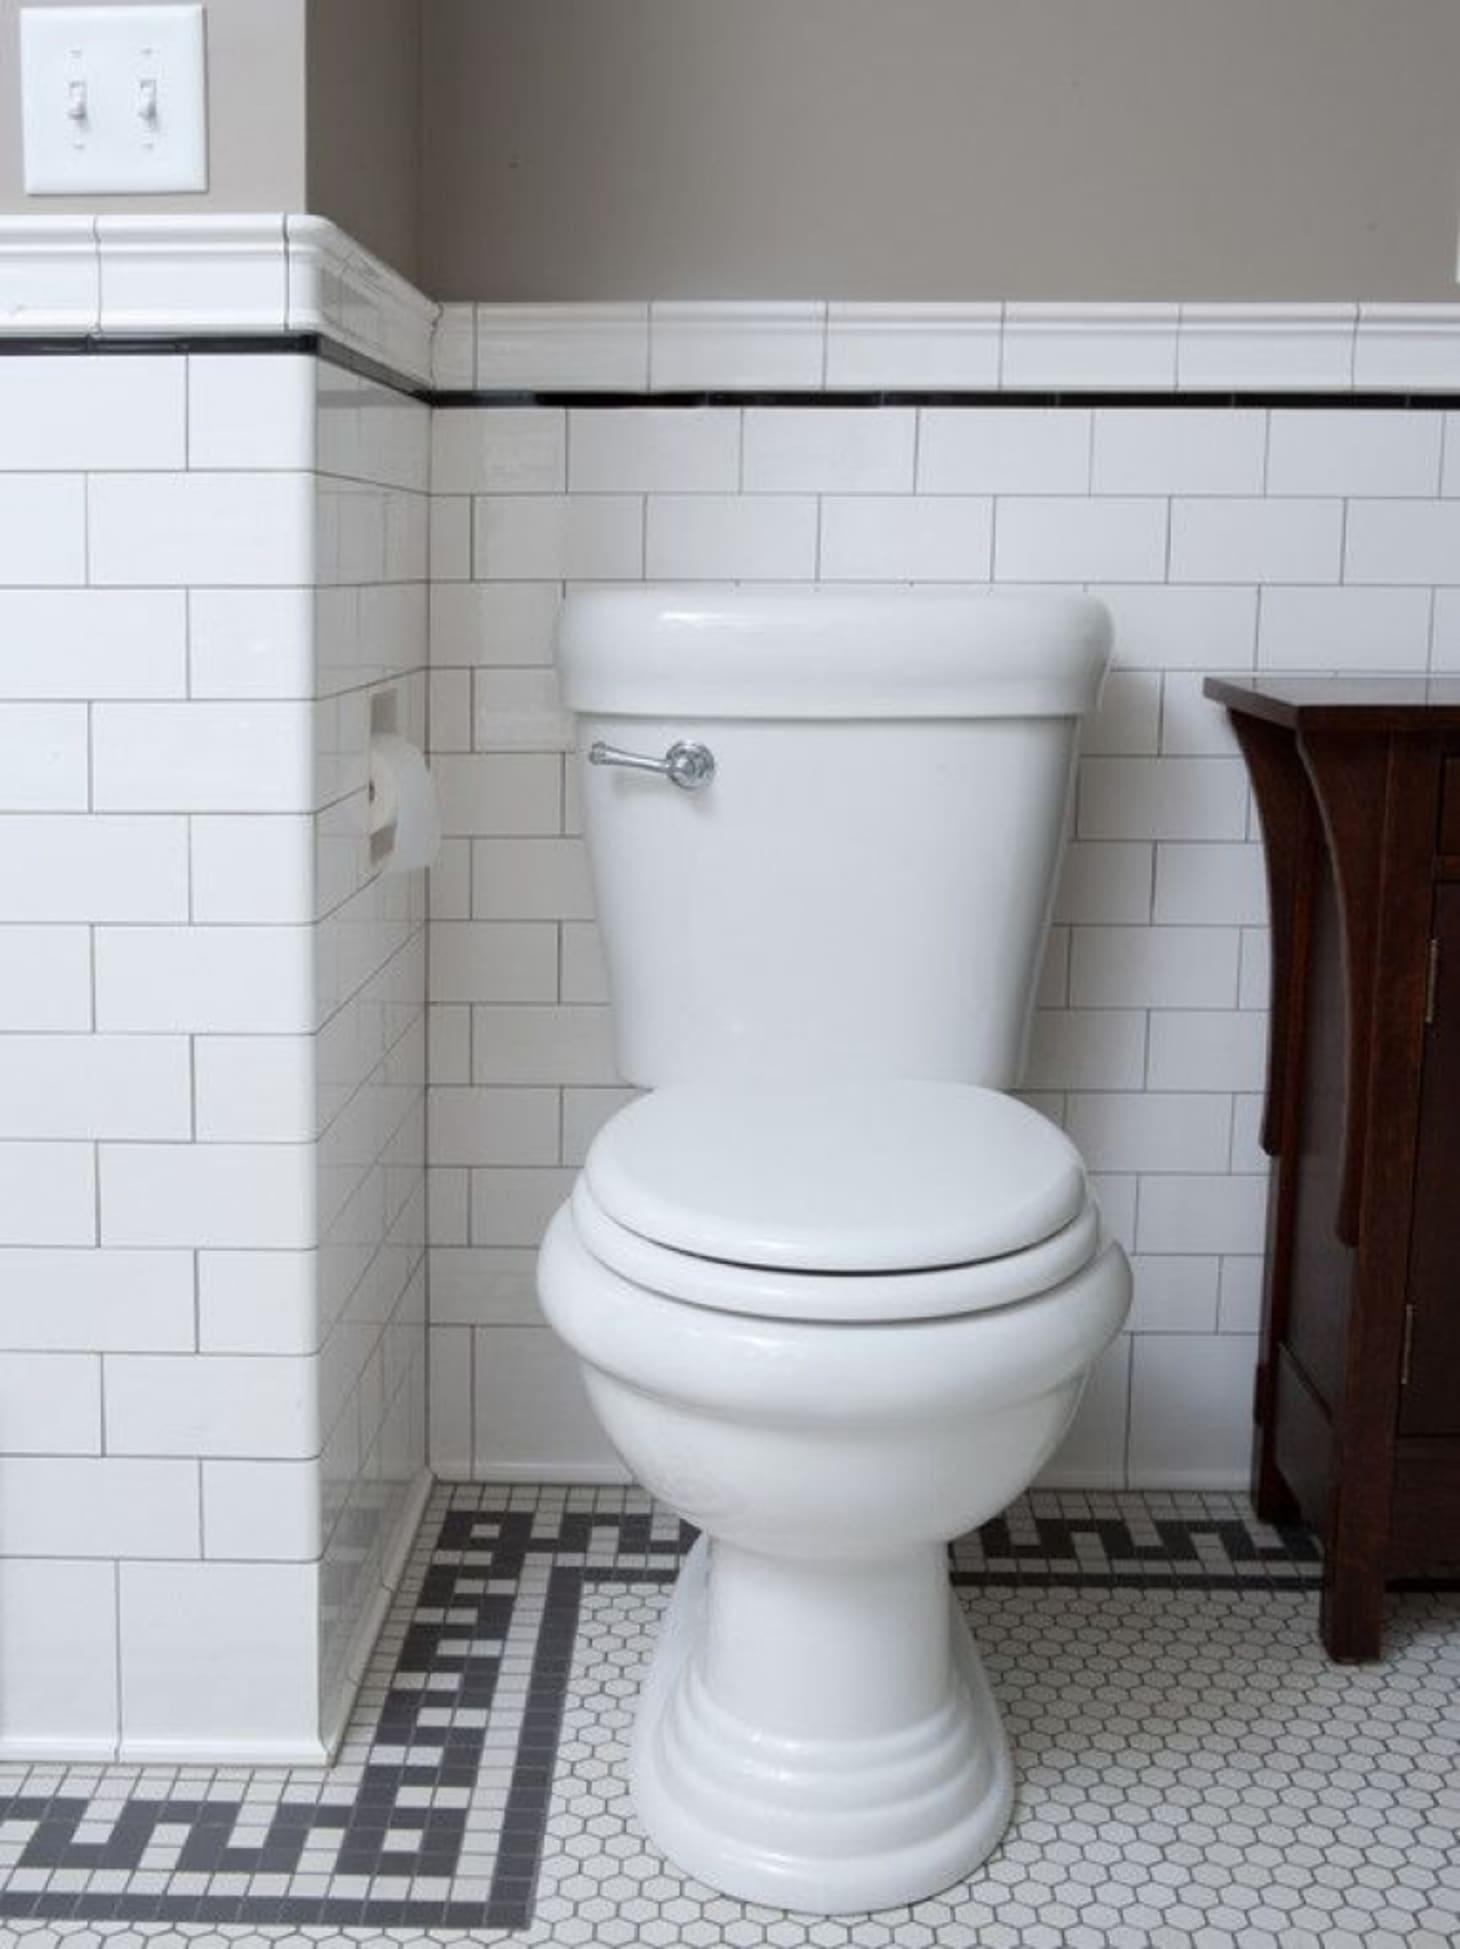 Mosaic Tile Floor Ideas For Vintage Style Bathrooms